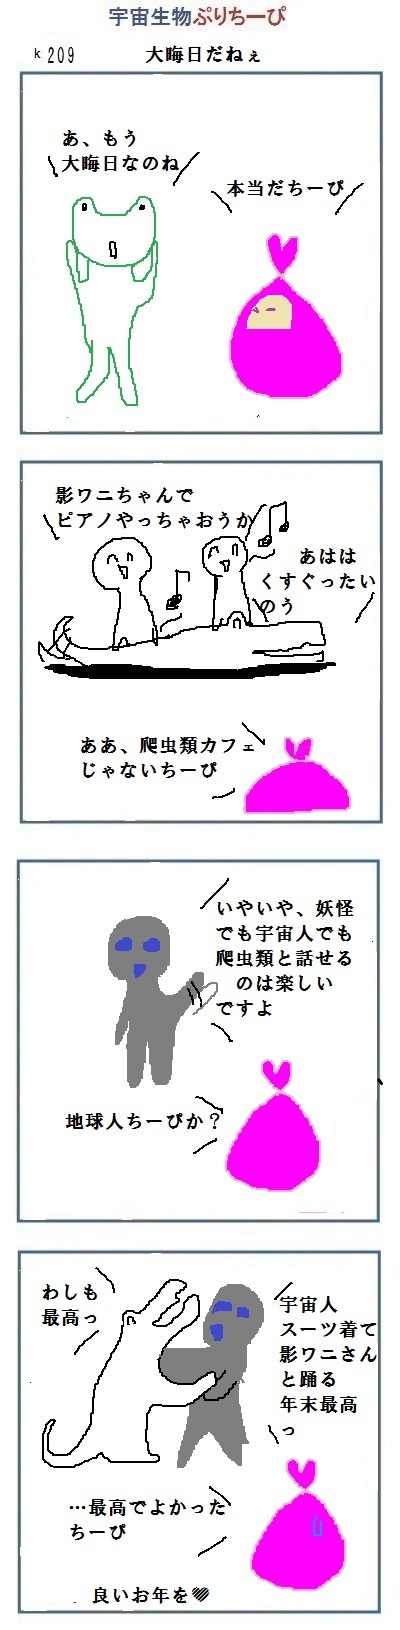 161231_k209